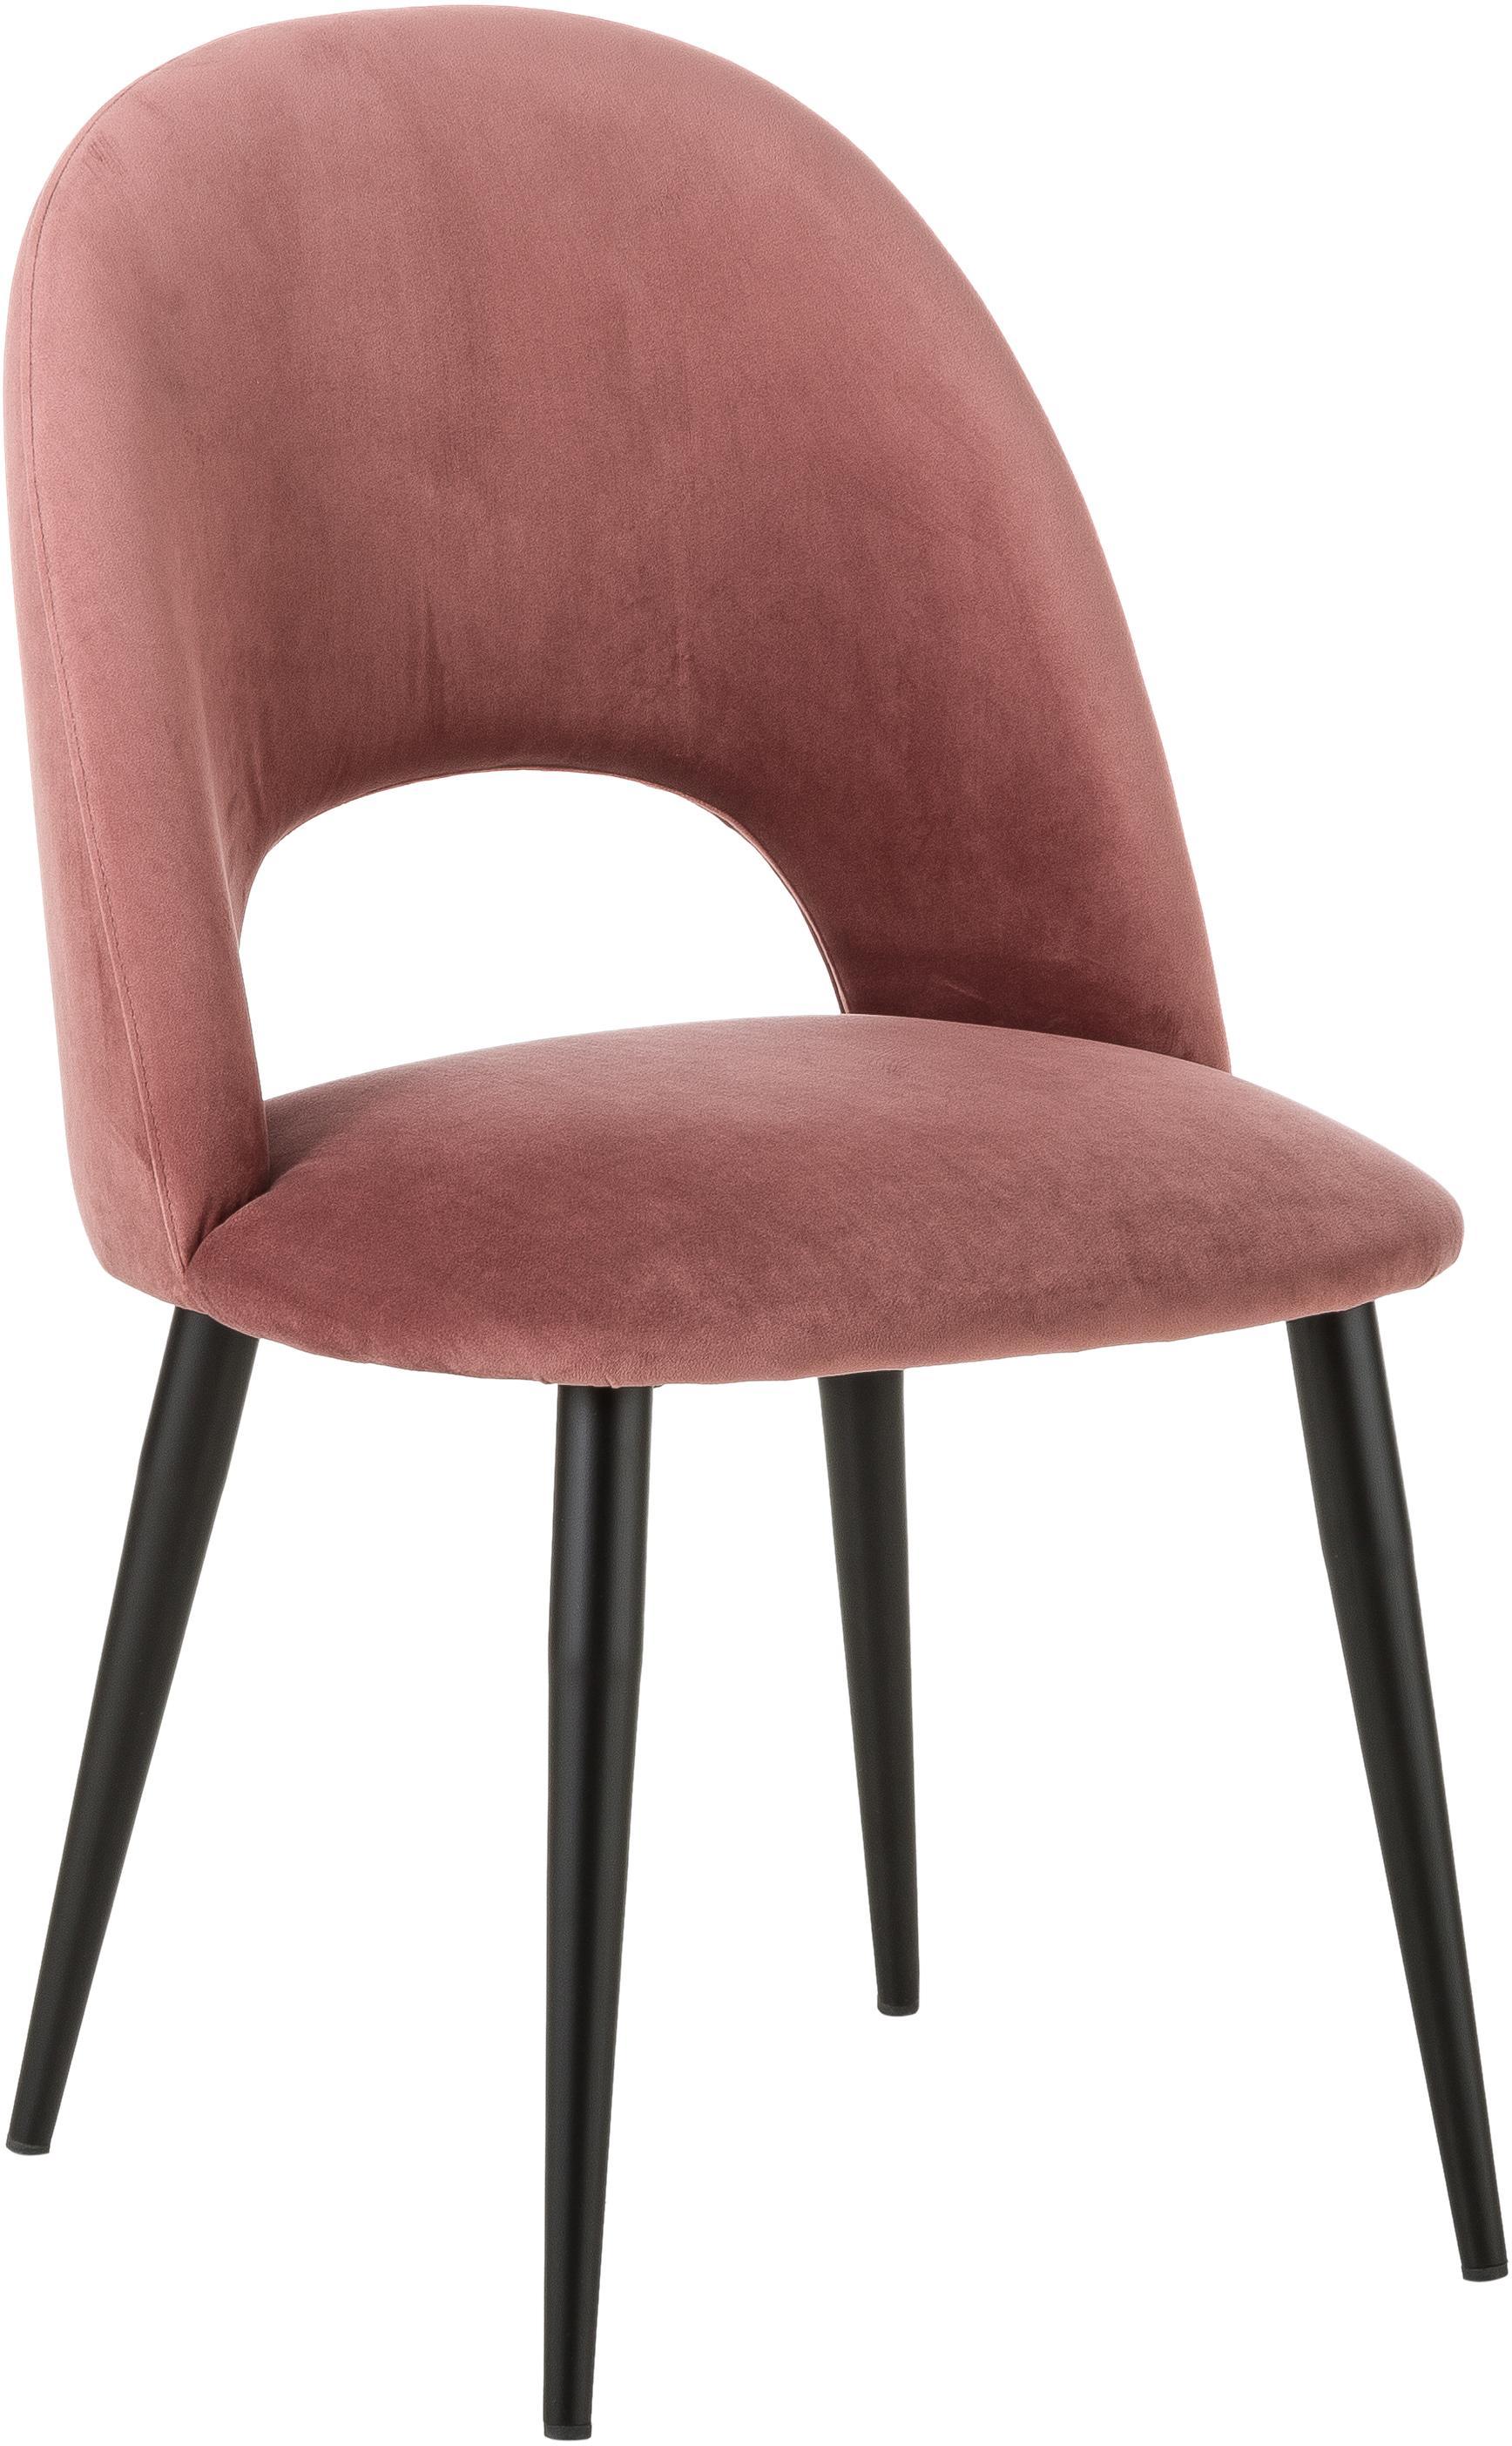 Sedia imbottita in velluto Rachel, Rivestimento: velluto (rivestimento in , Gambe: metallo verniciato a polv, Velluto rosa cipria, Larg. 53 x Prof. 57 cm